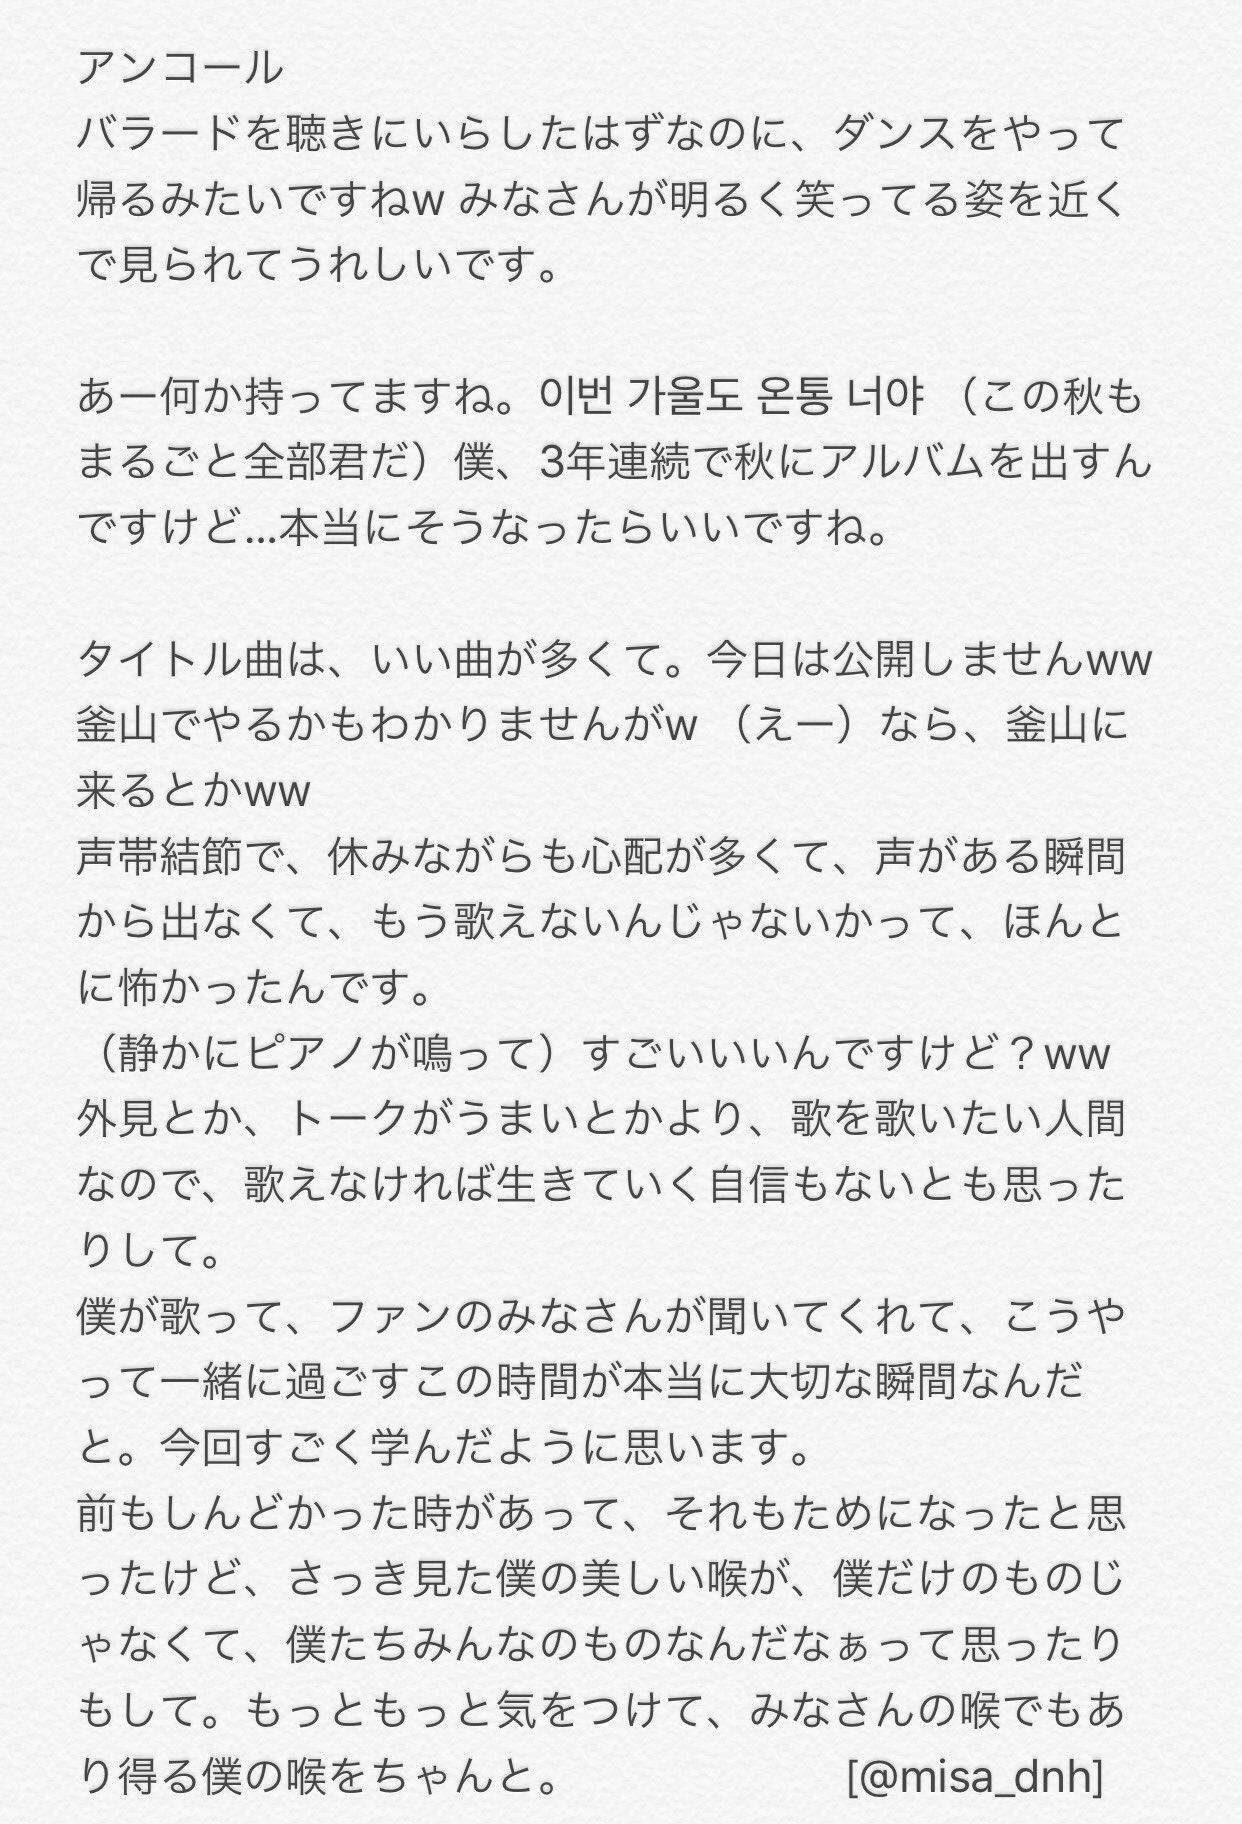 201610310144284cc.jpg